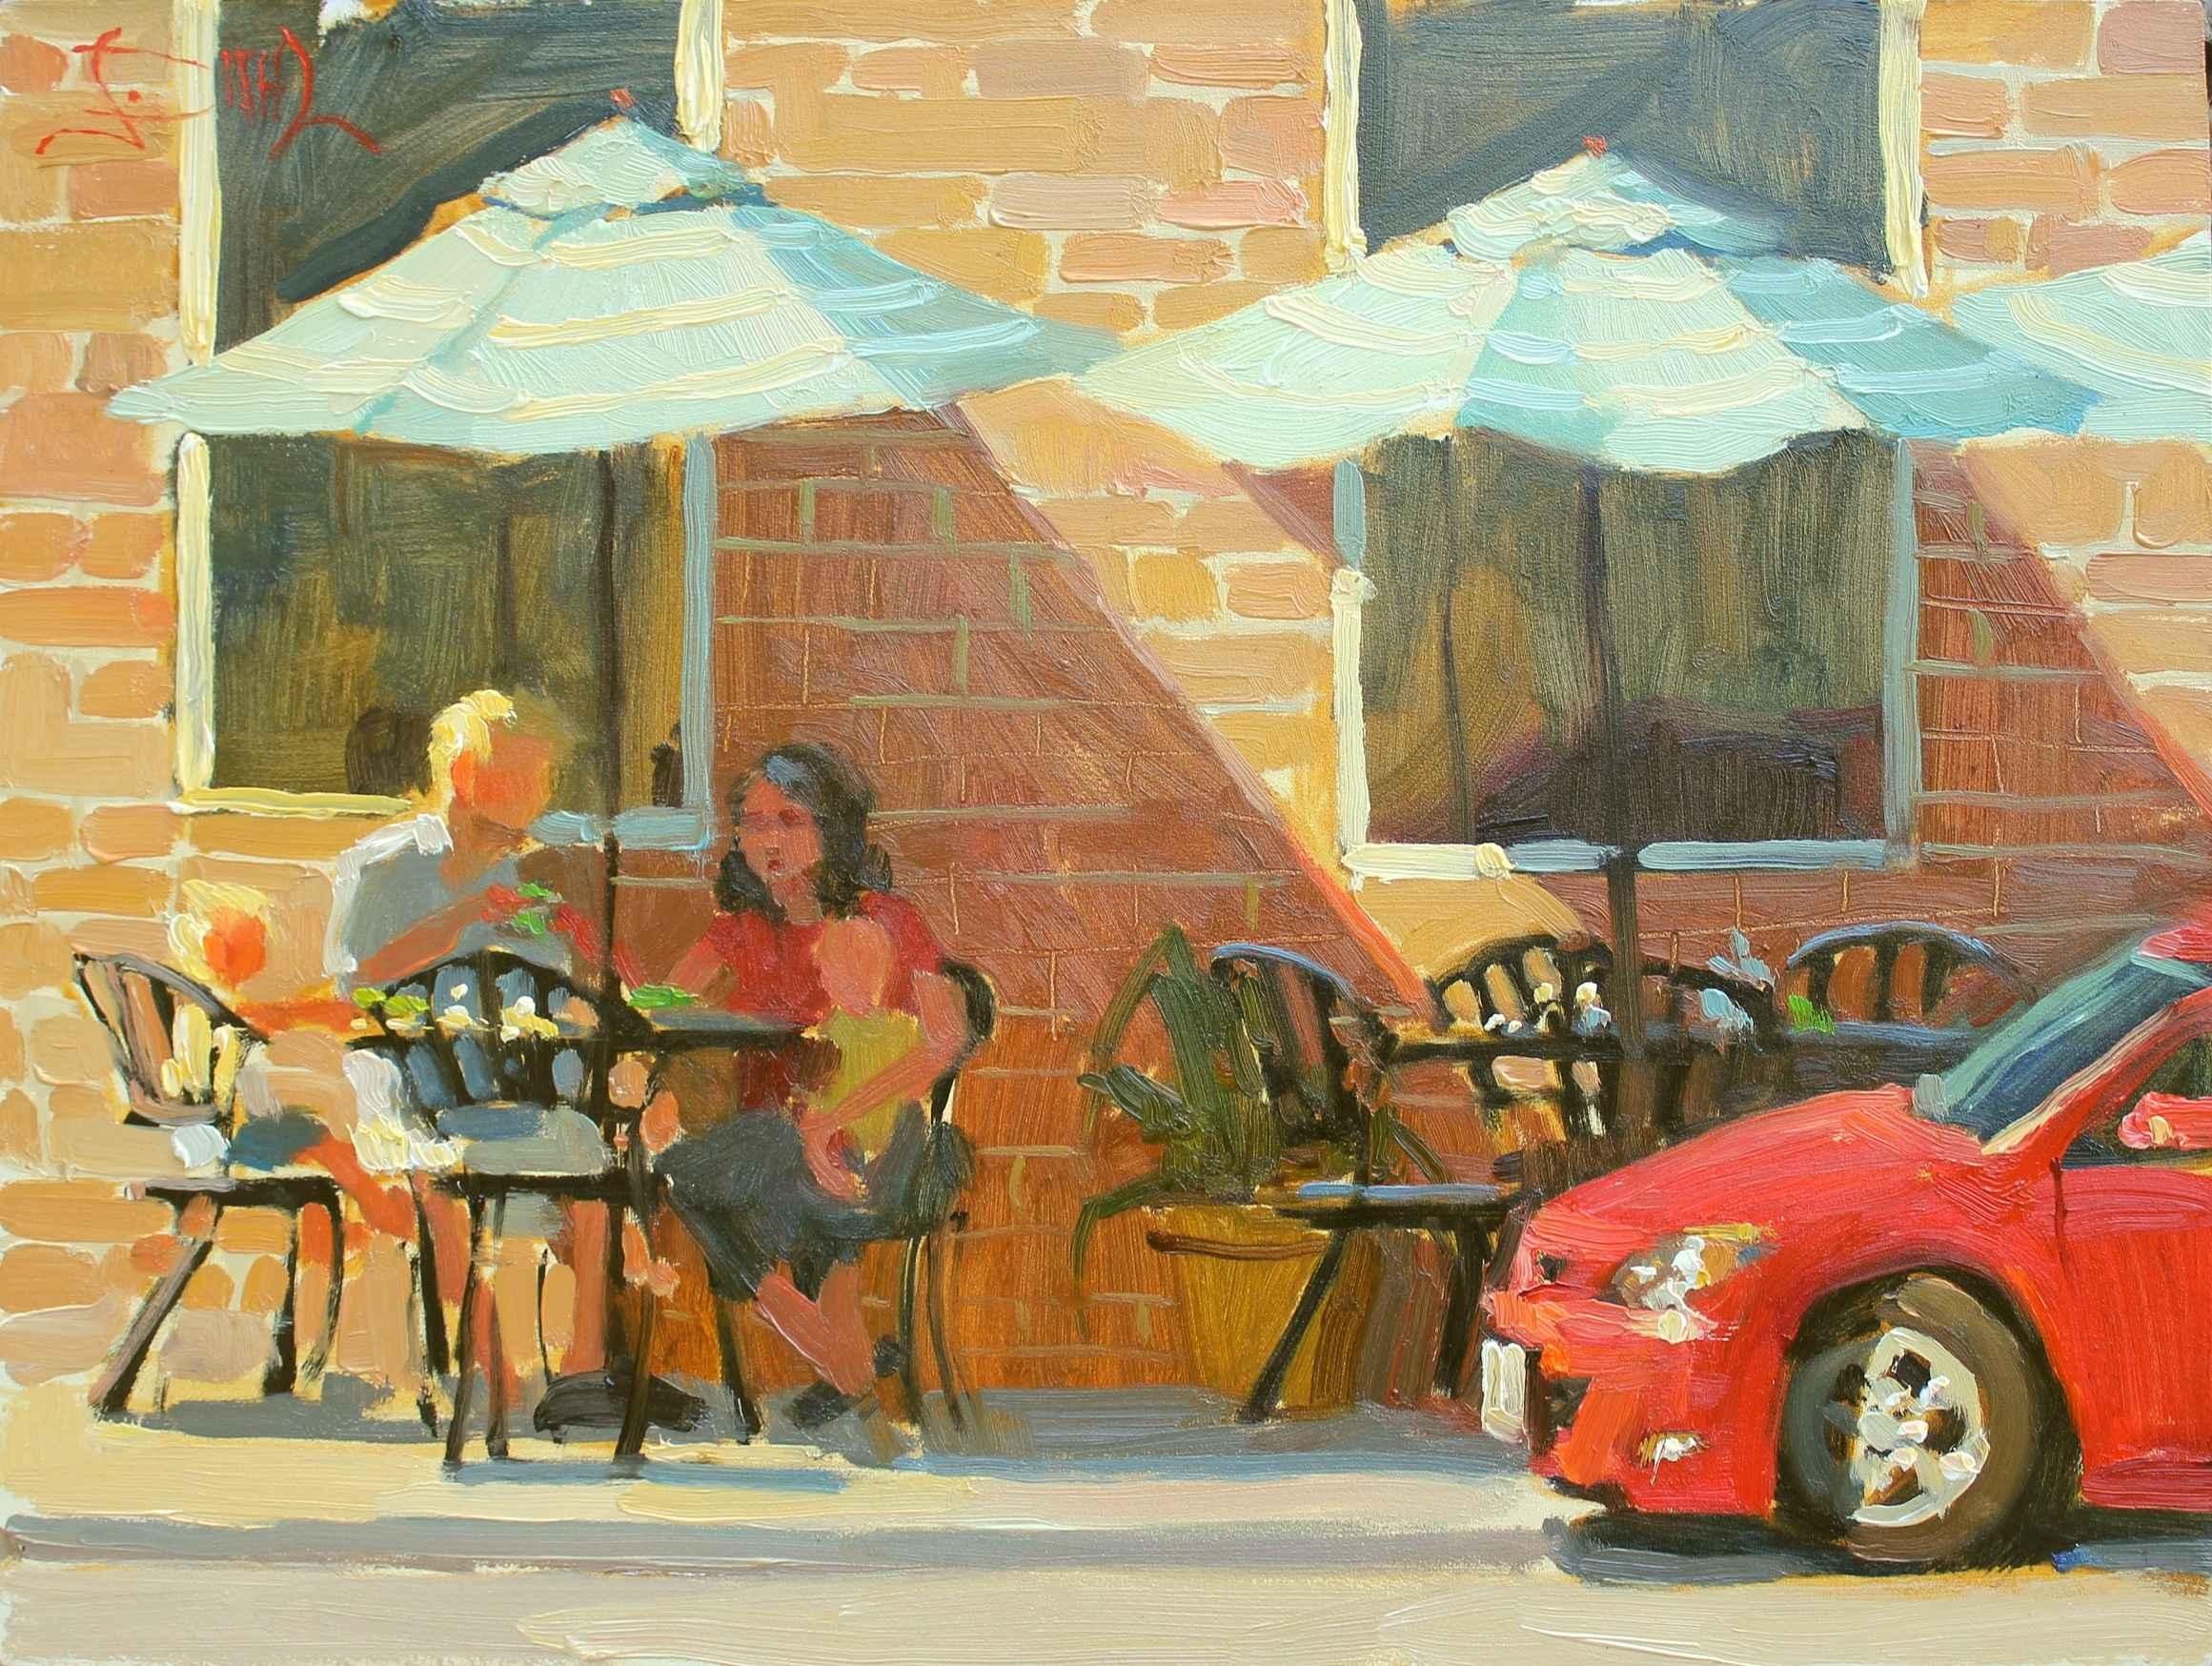 Break in the Shade by  Jennifer Diehl - Masterpiece Online